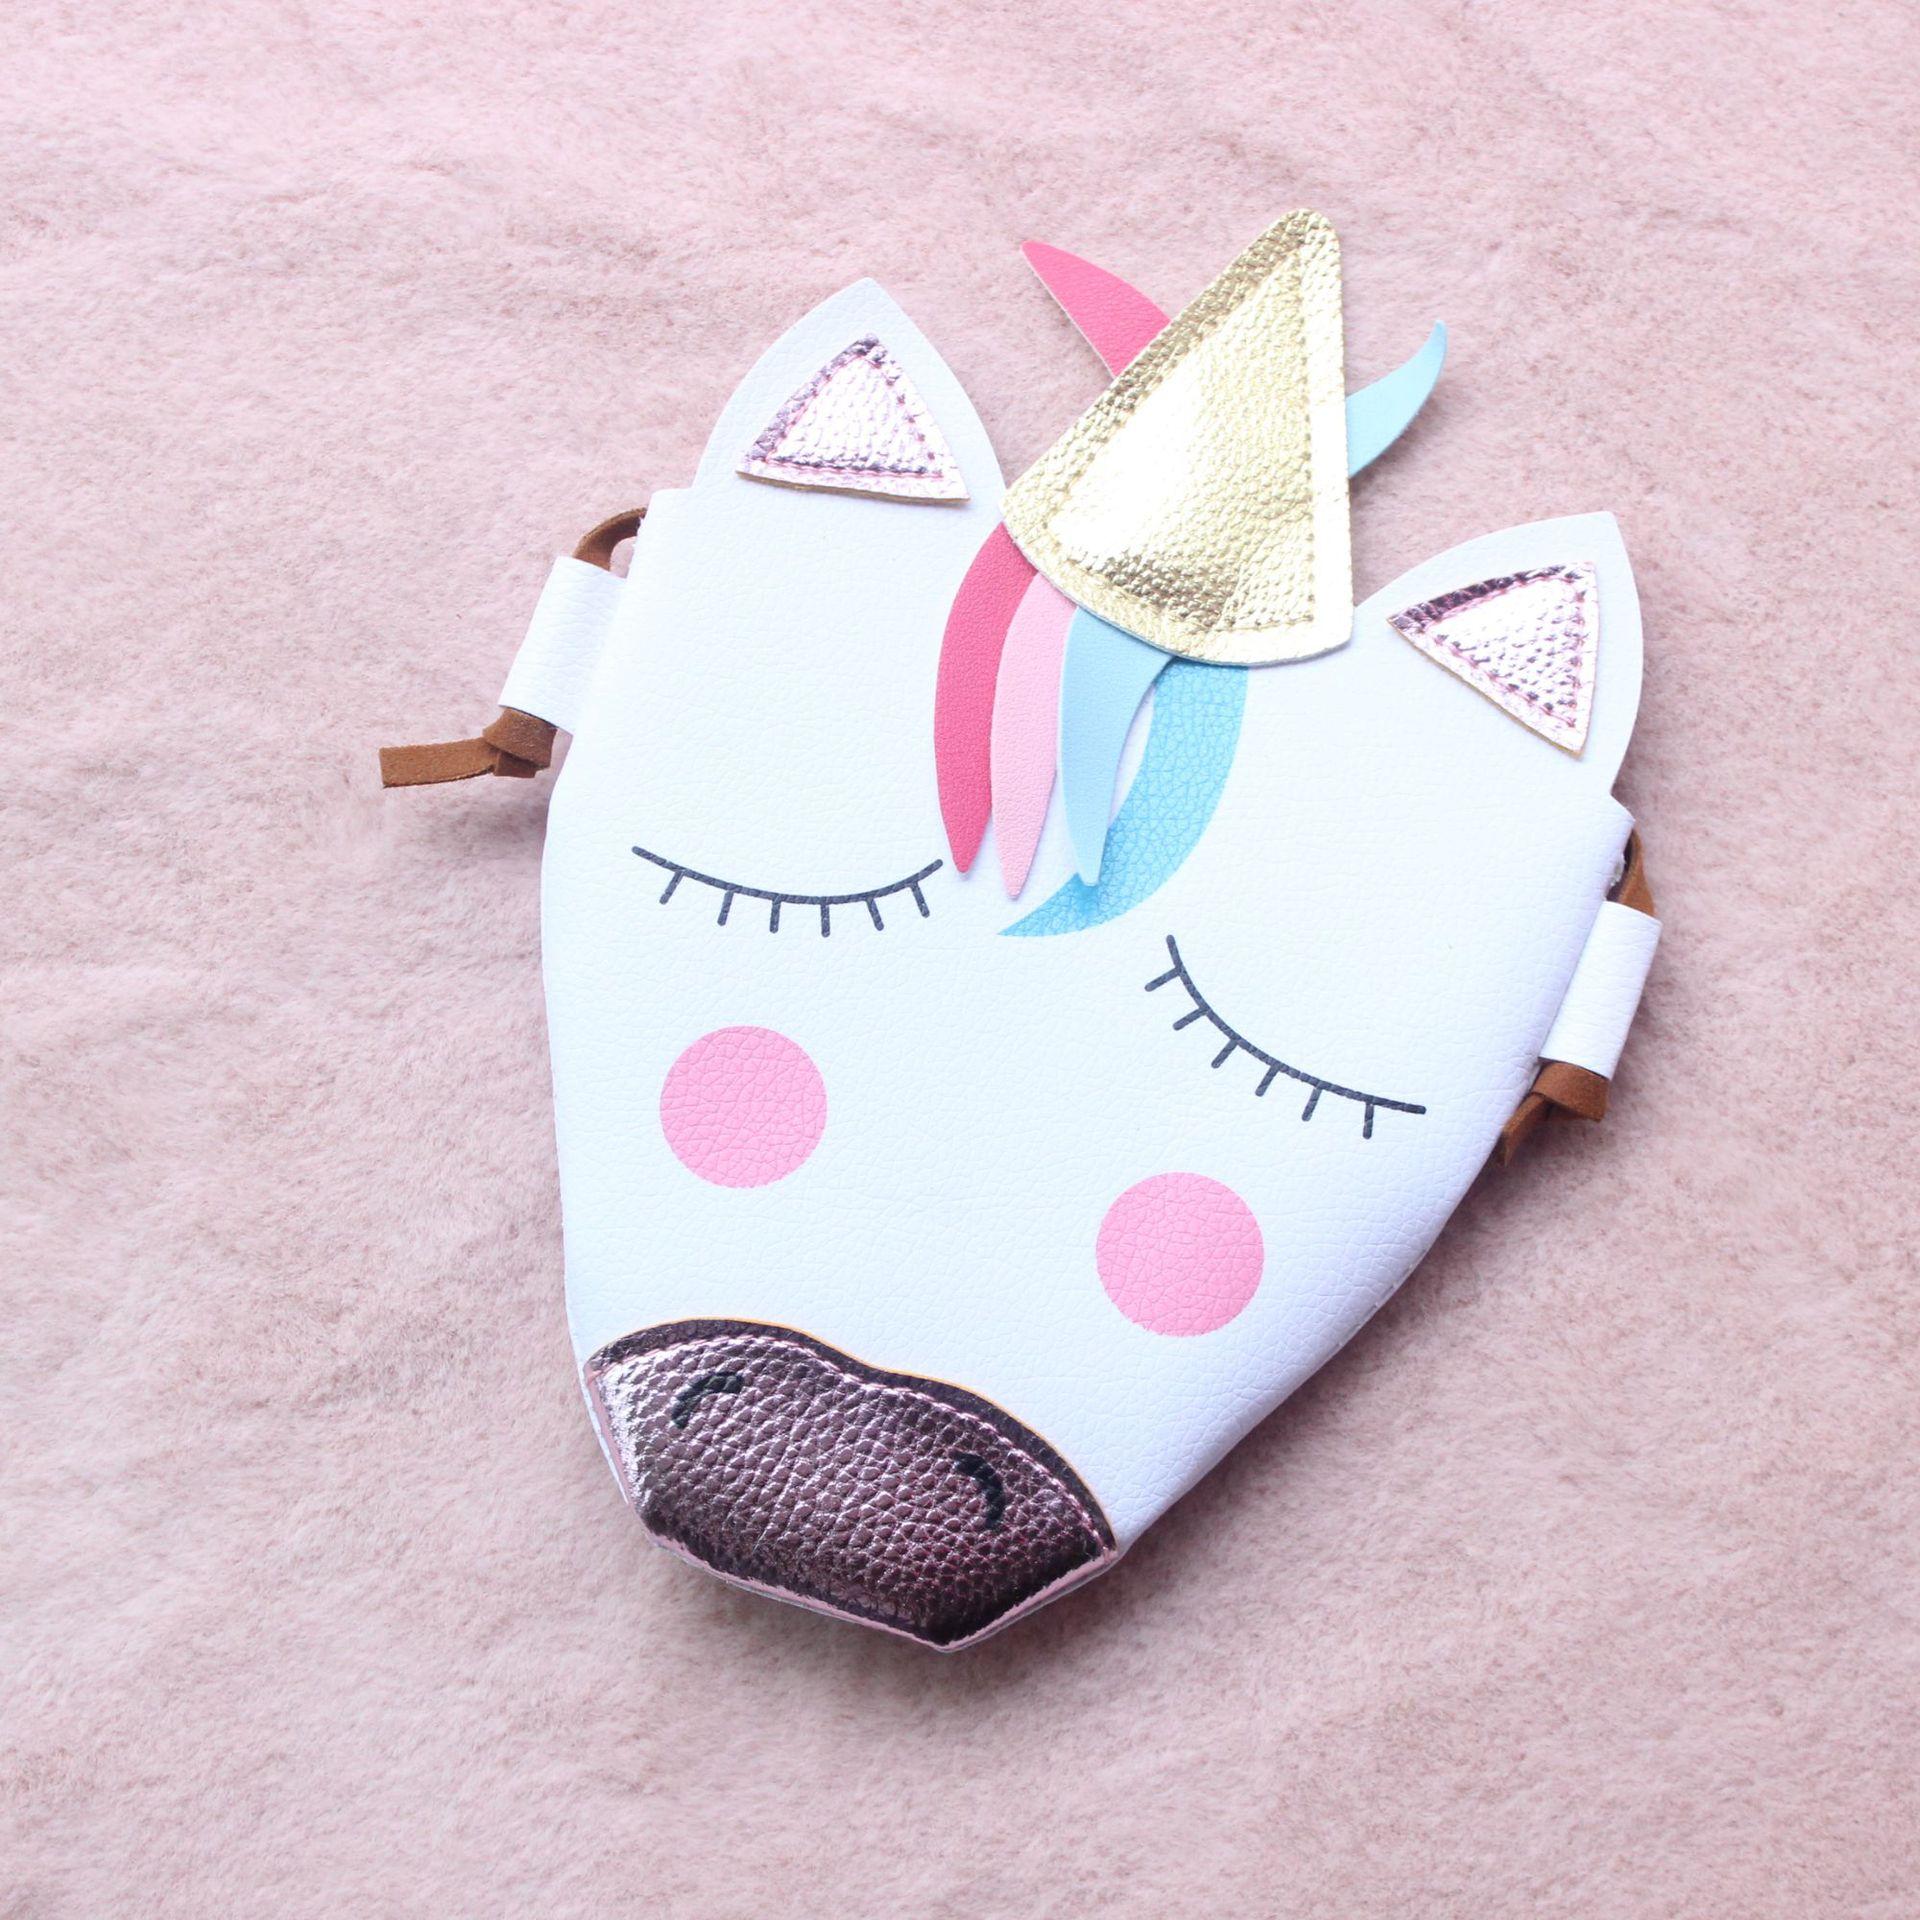 985a9c0ffa42 Baby Toddler Infant Coin Purse Handbag Girl Shoulder Bag Children Wallet  Cartoon Cute Animal Kid Crossbody Bag